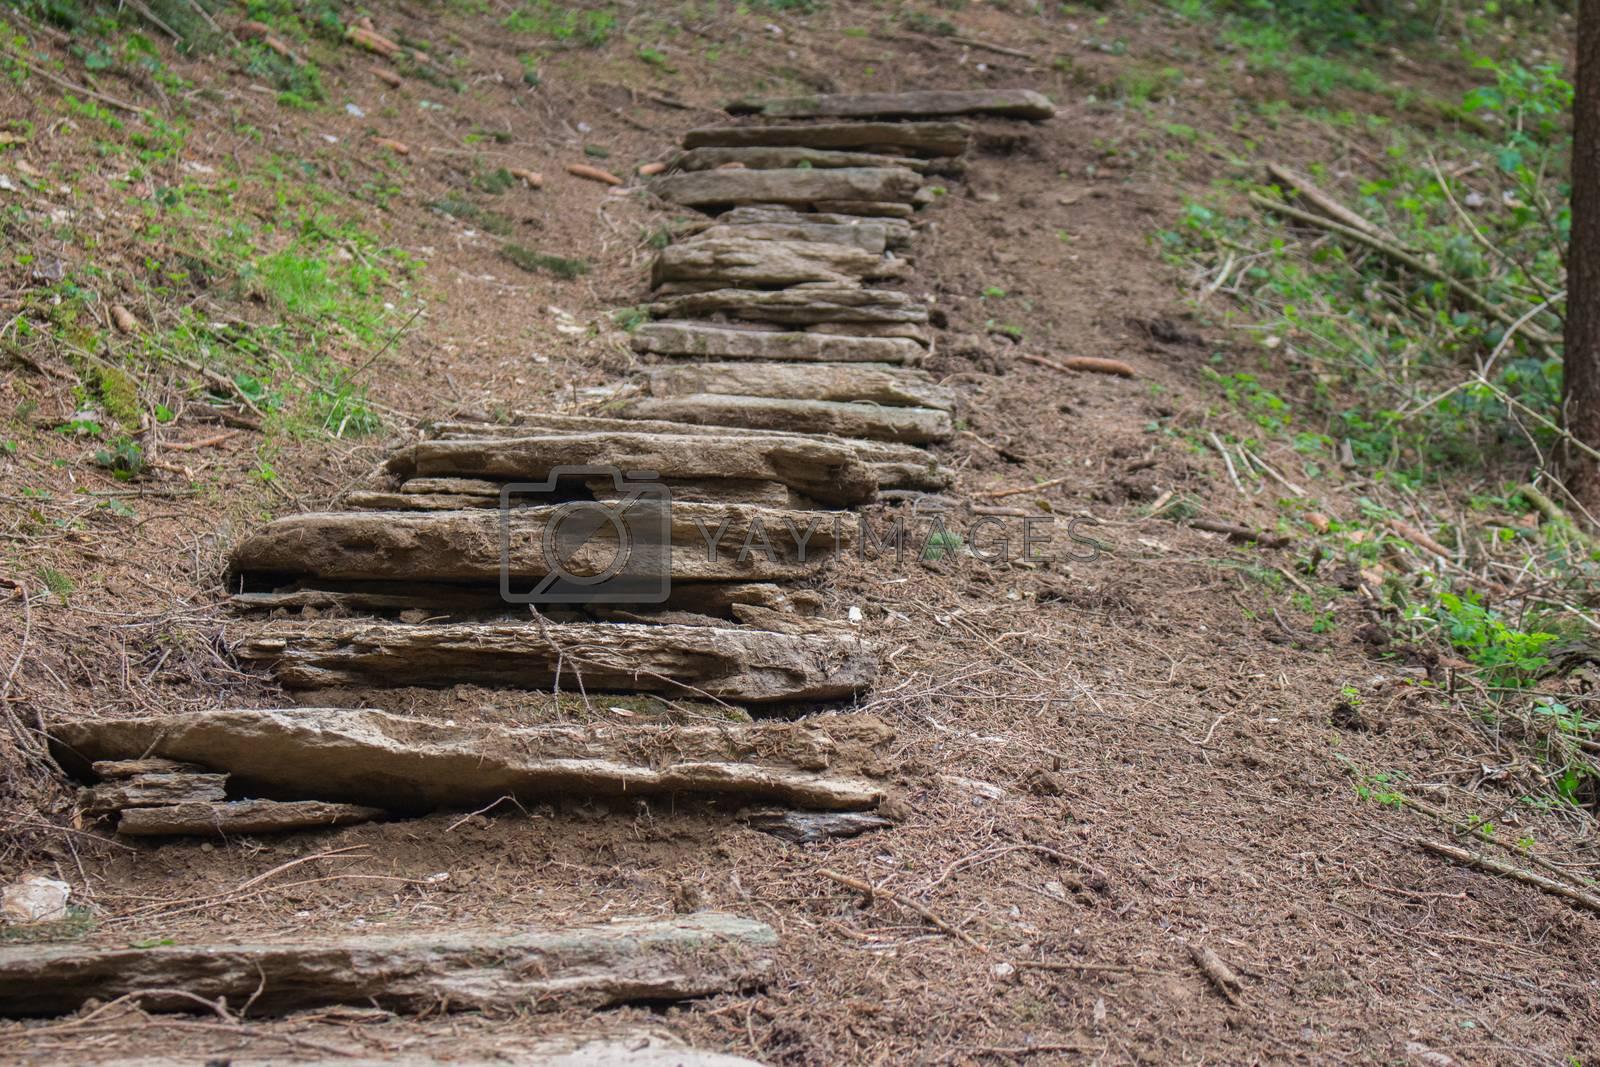 Ancient Roman path in the Austrian Alps